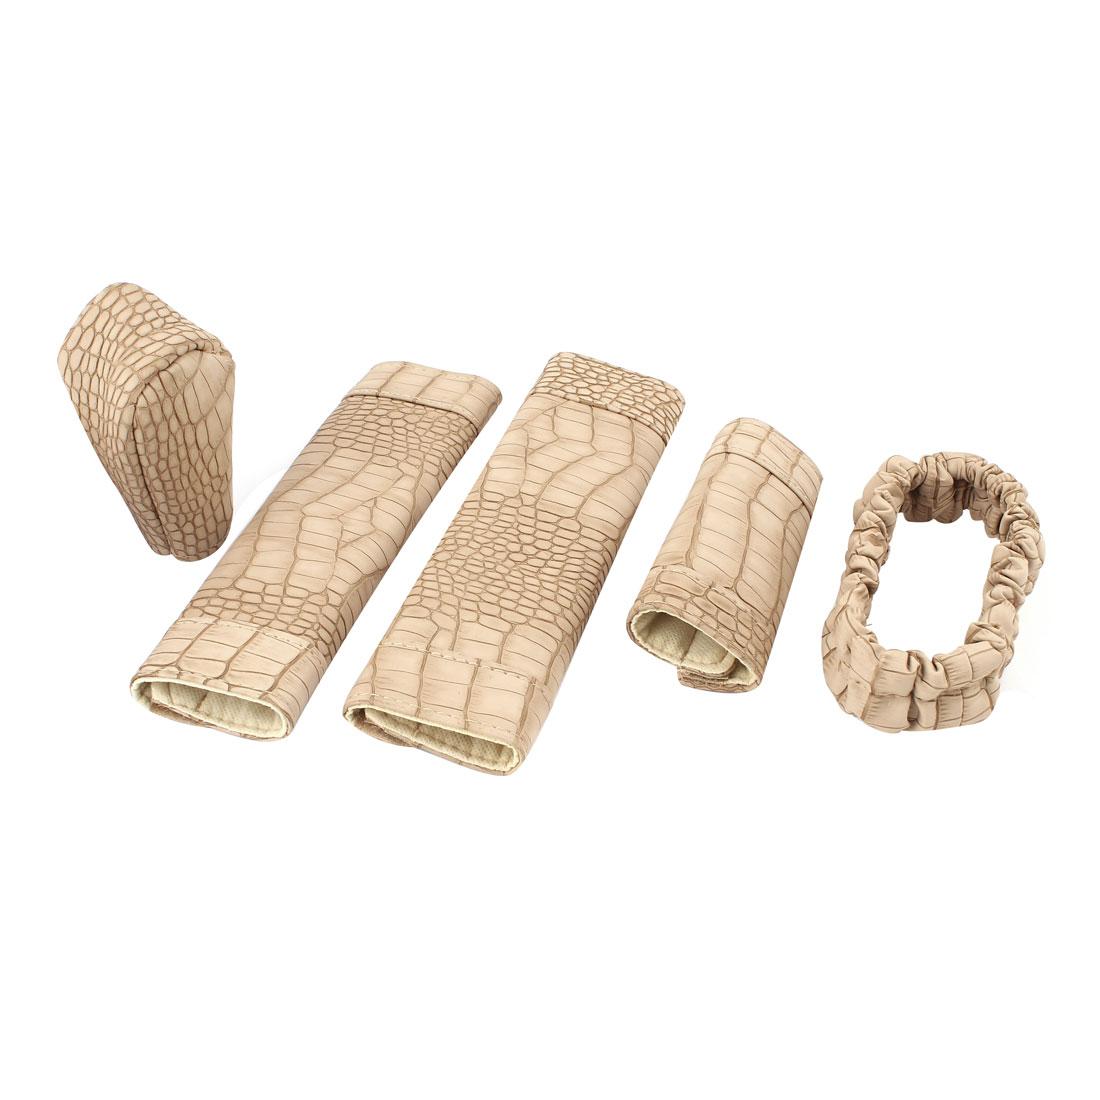 Car Beige Crocodile Prints Handbrake Seatbelt Shift Knob Cover Set 5 in 1